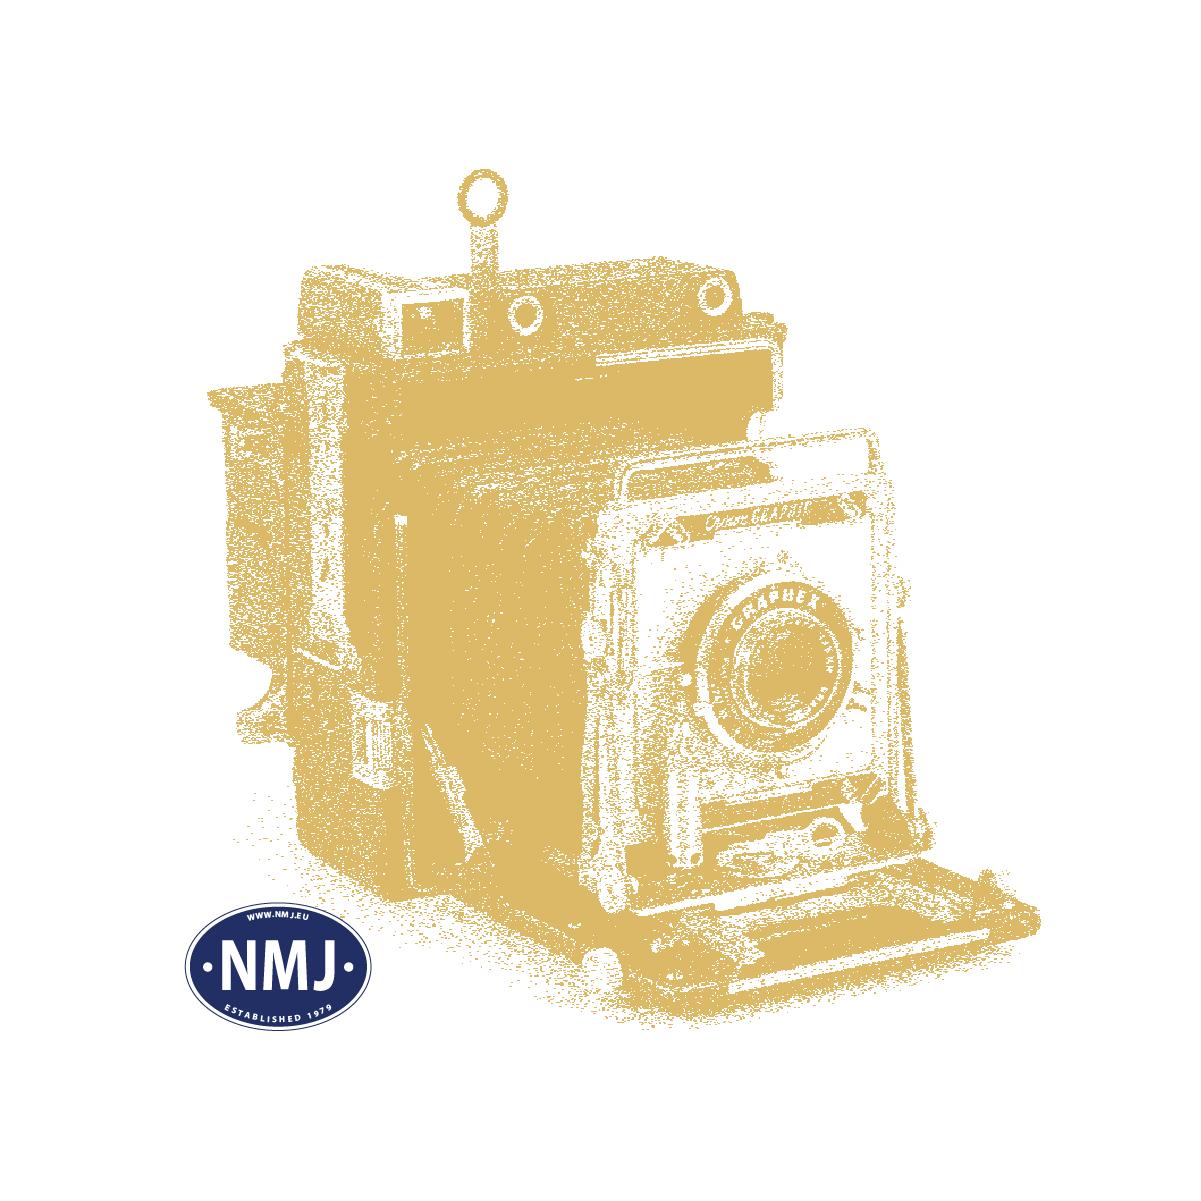 NMJT90104 - NMJ Topline DSB MY 1135, Nohab DC